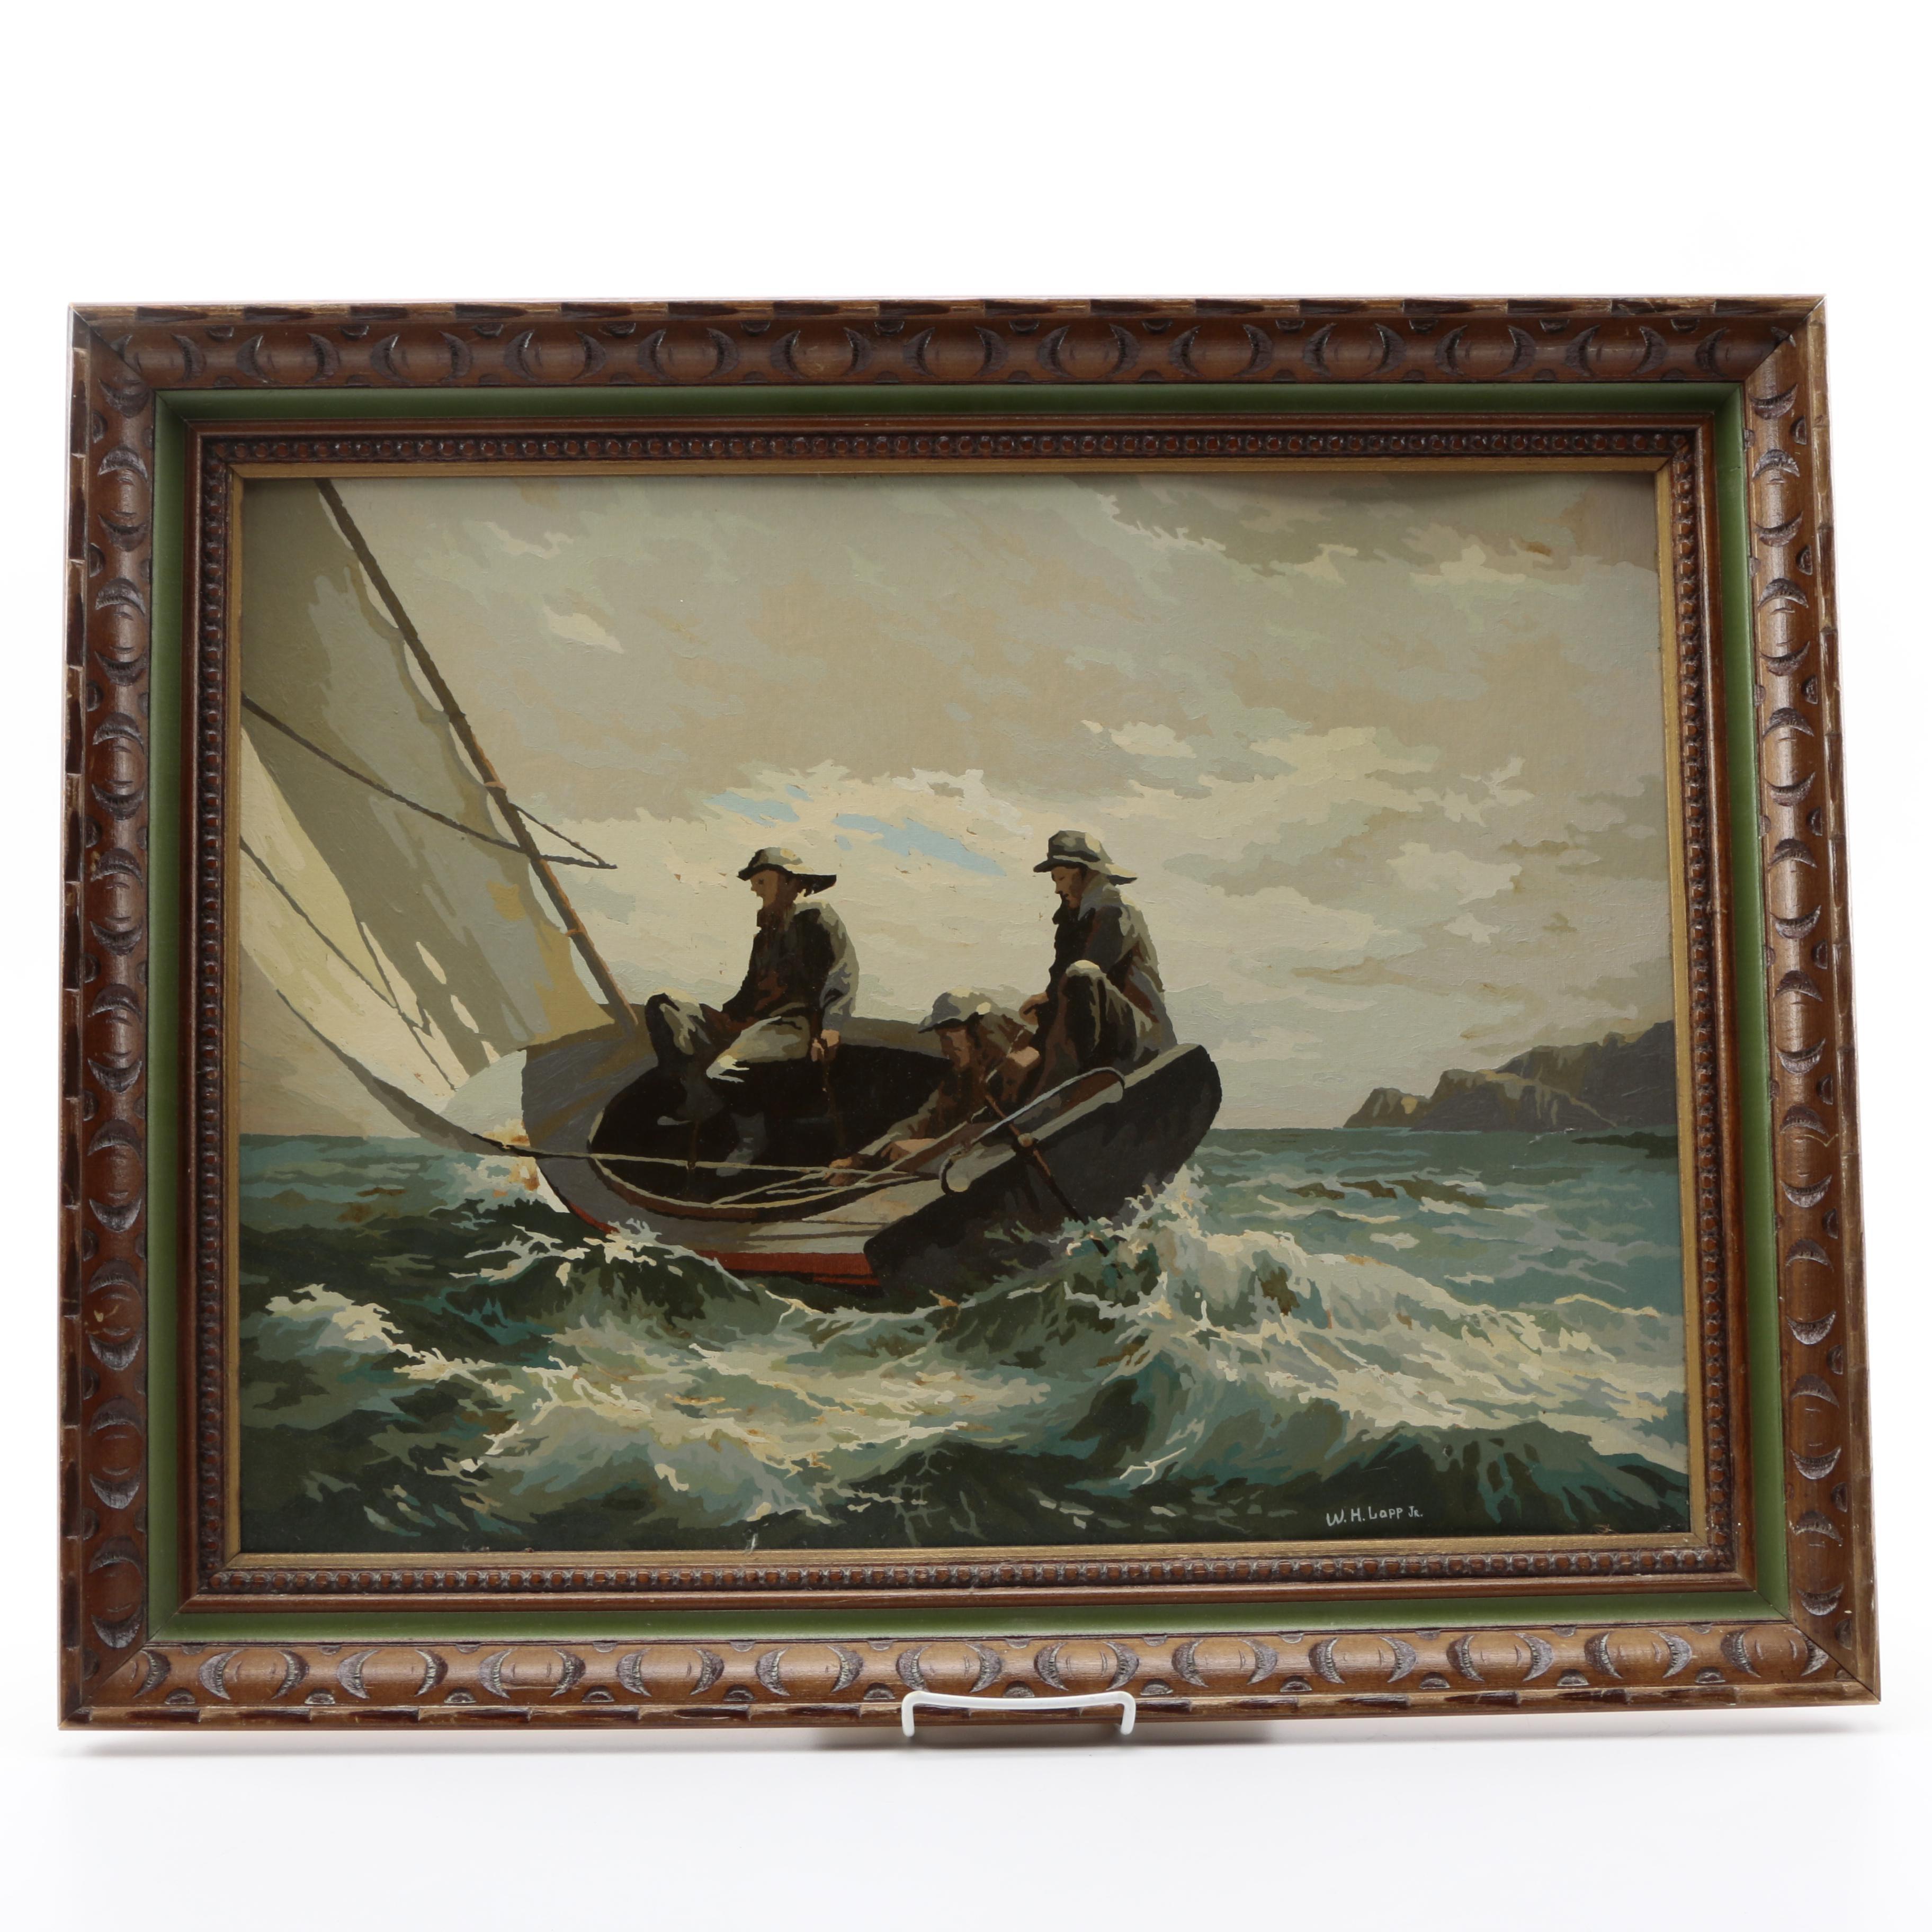 W.H Loop Jr. Acrylic Paint by Numbers on Board of Fishermen